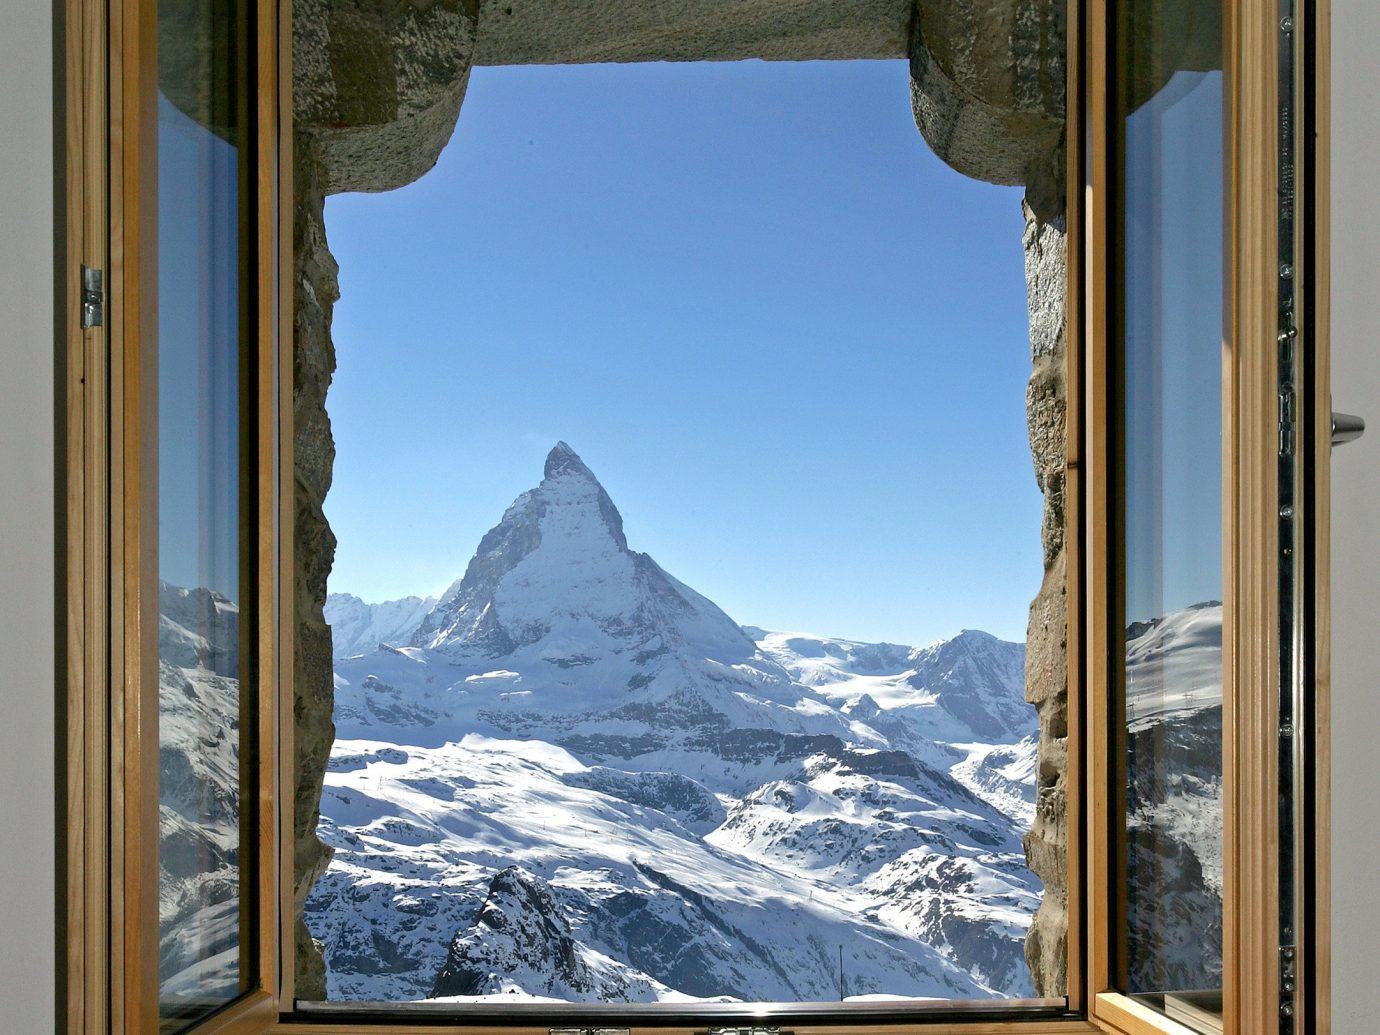 Hotels Offbeat window sky picture frame daylighting interior design